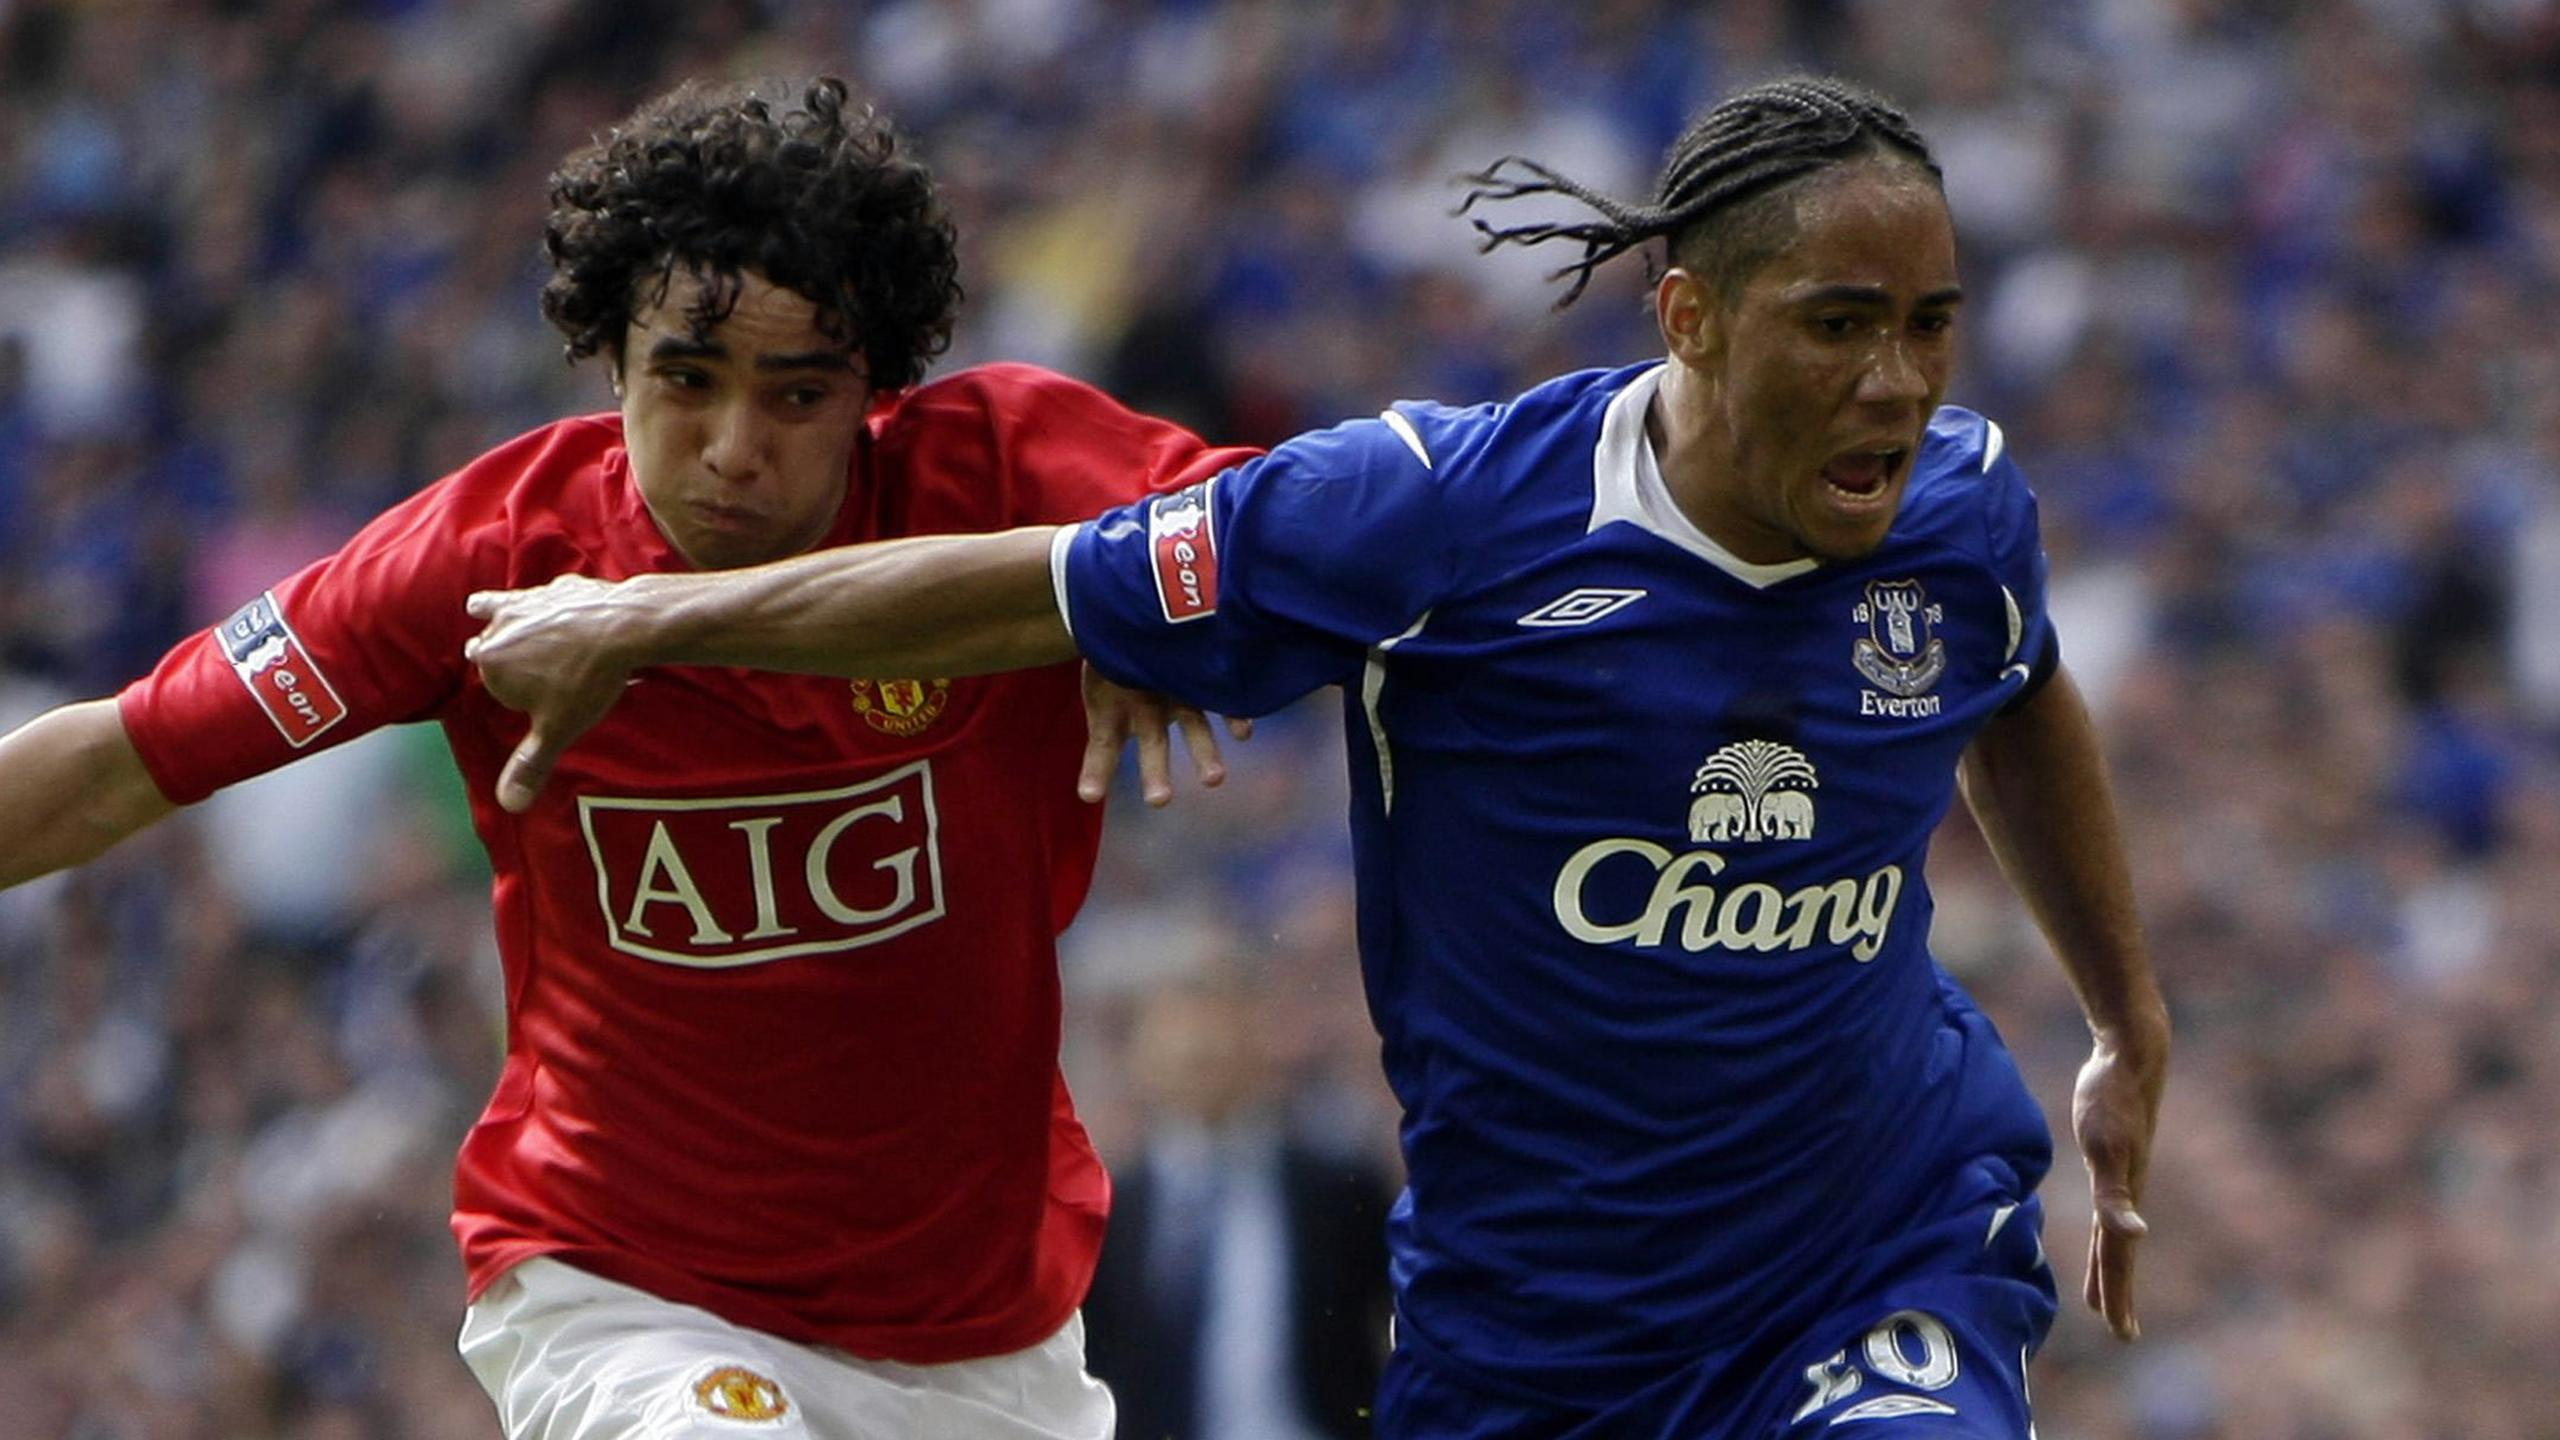 Финал кубка англии 2009 челси эвертон